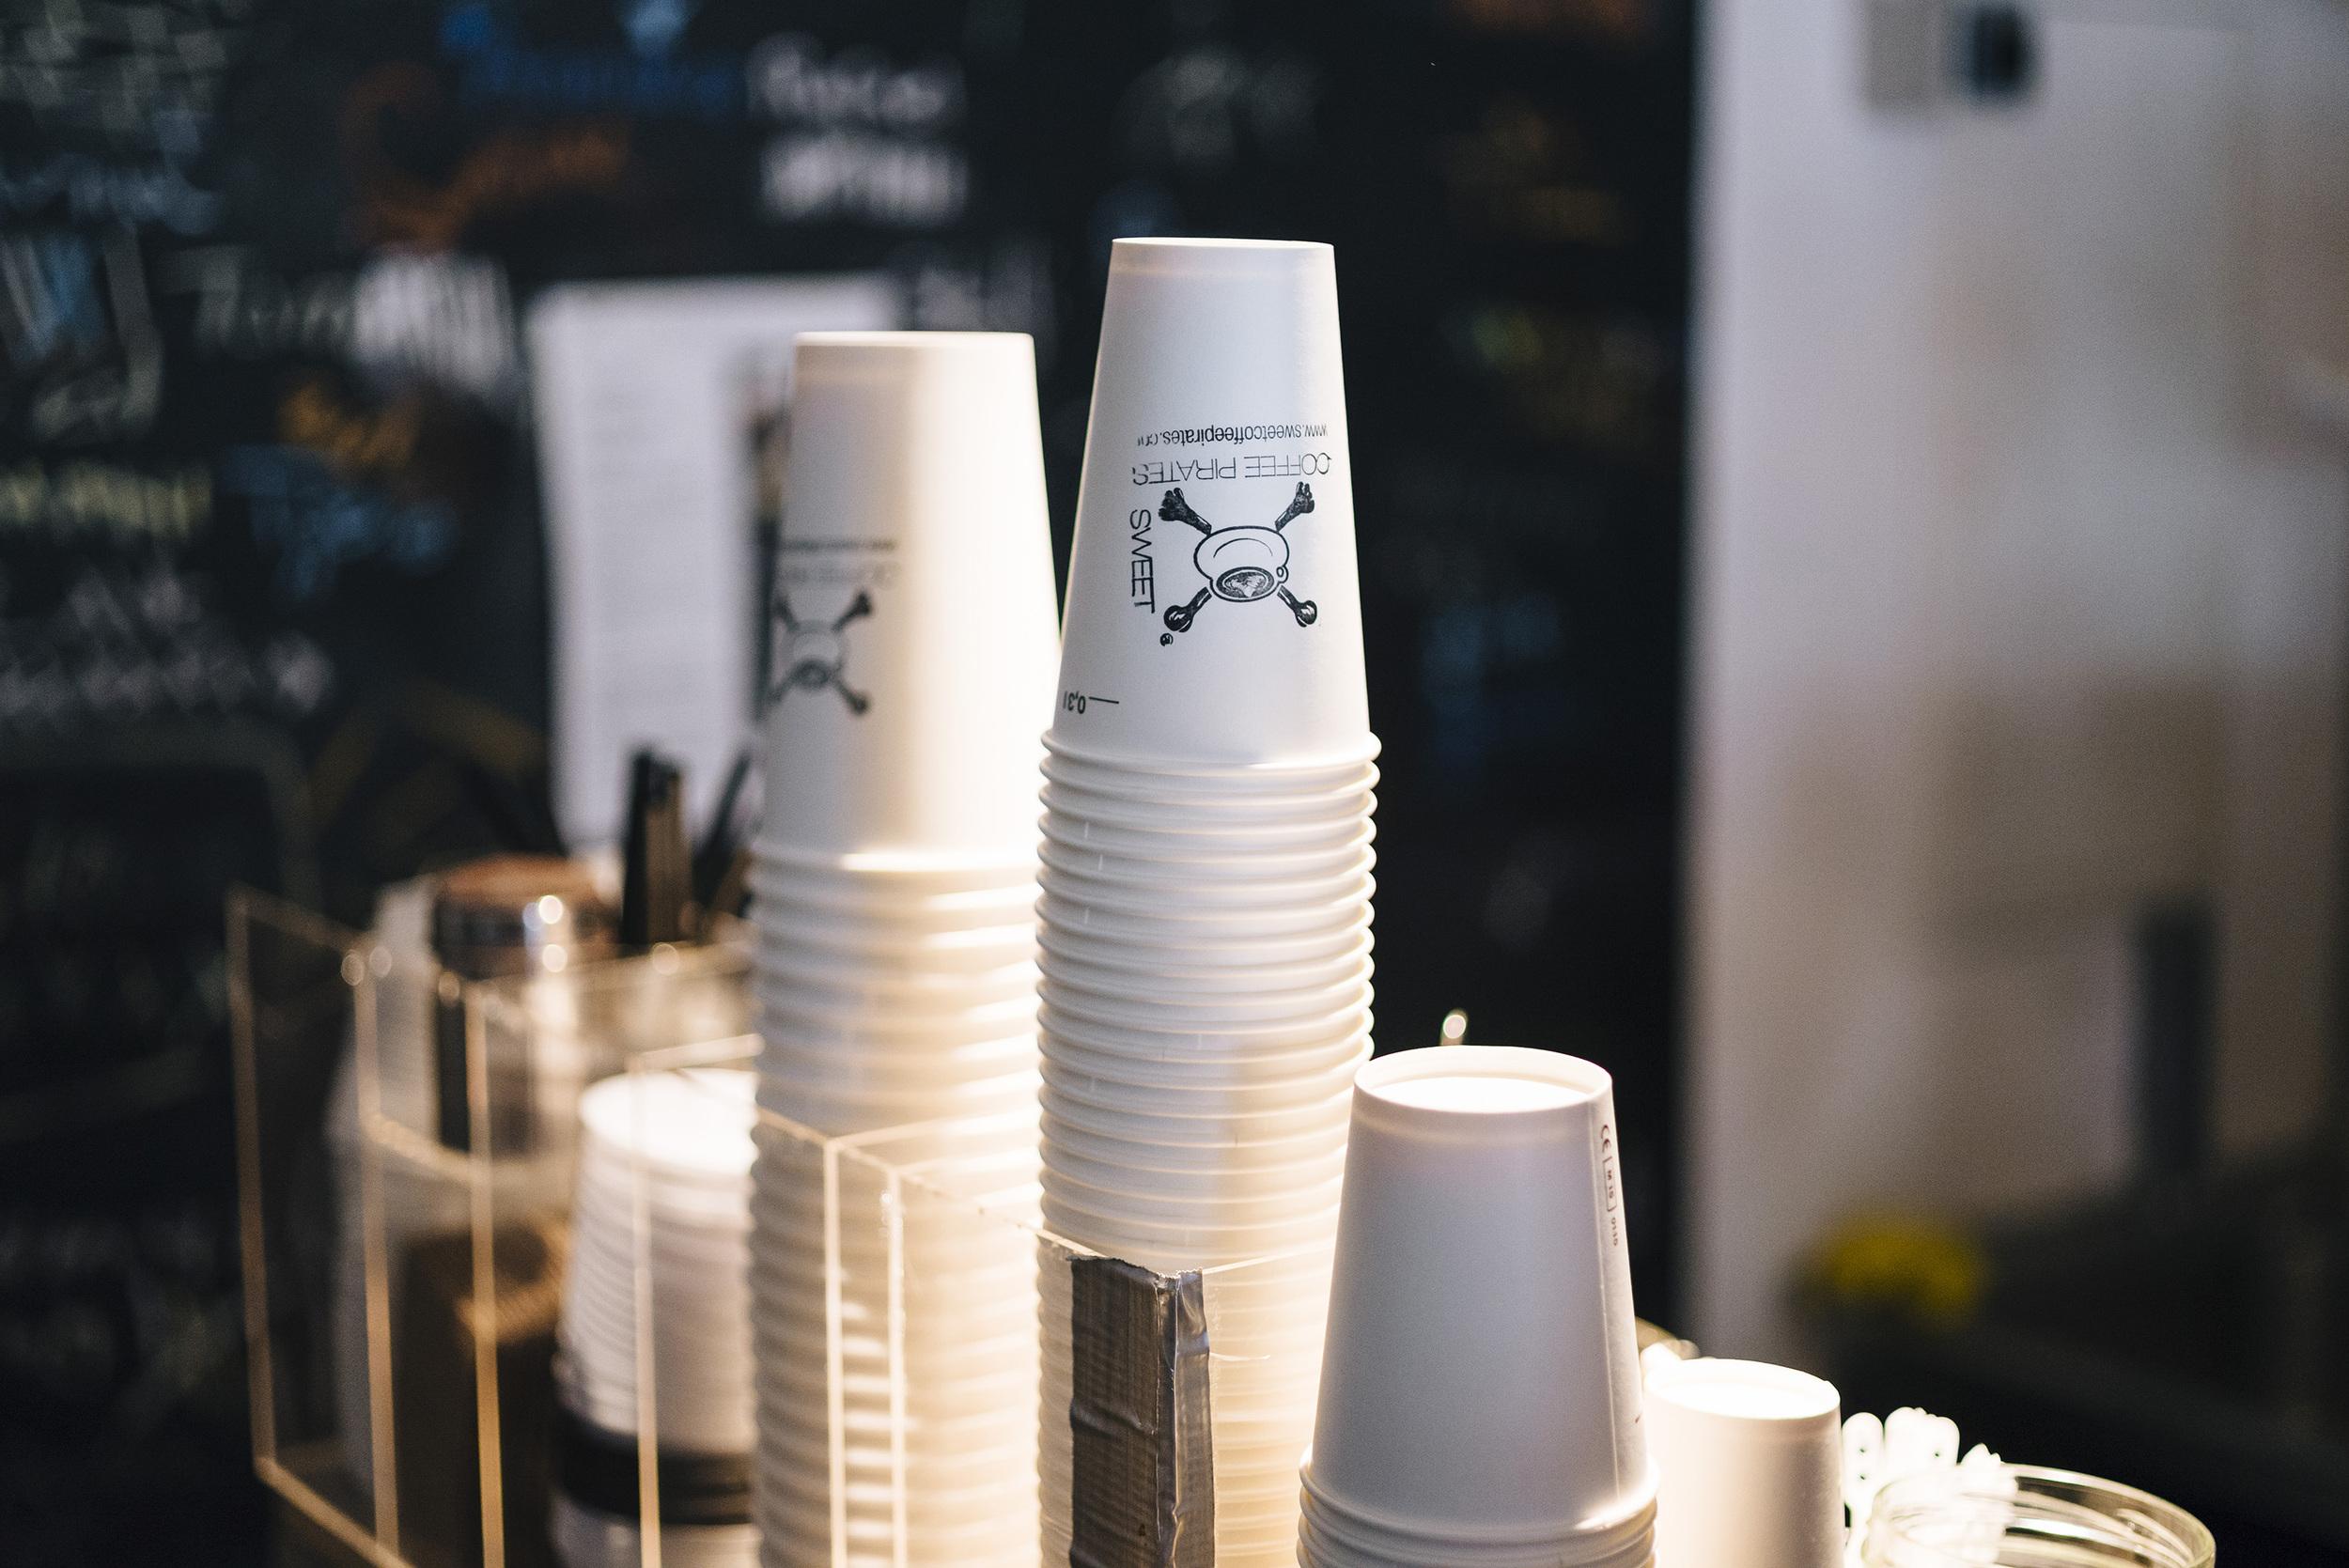 sweet-coffee-pirates-rüttenscheid-essen-pottspott-20.jpg